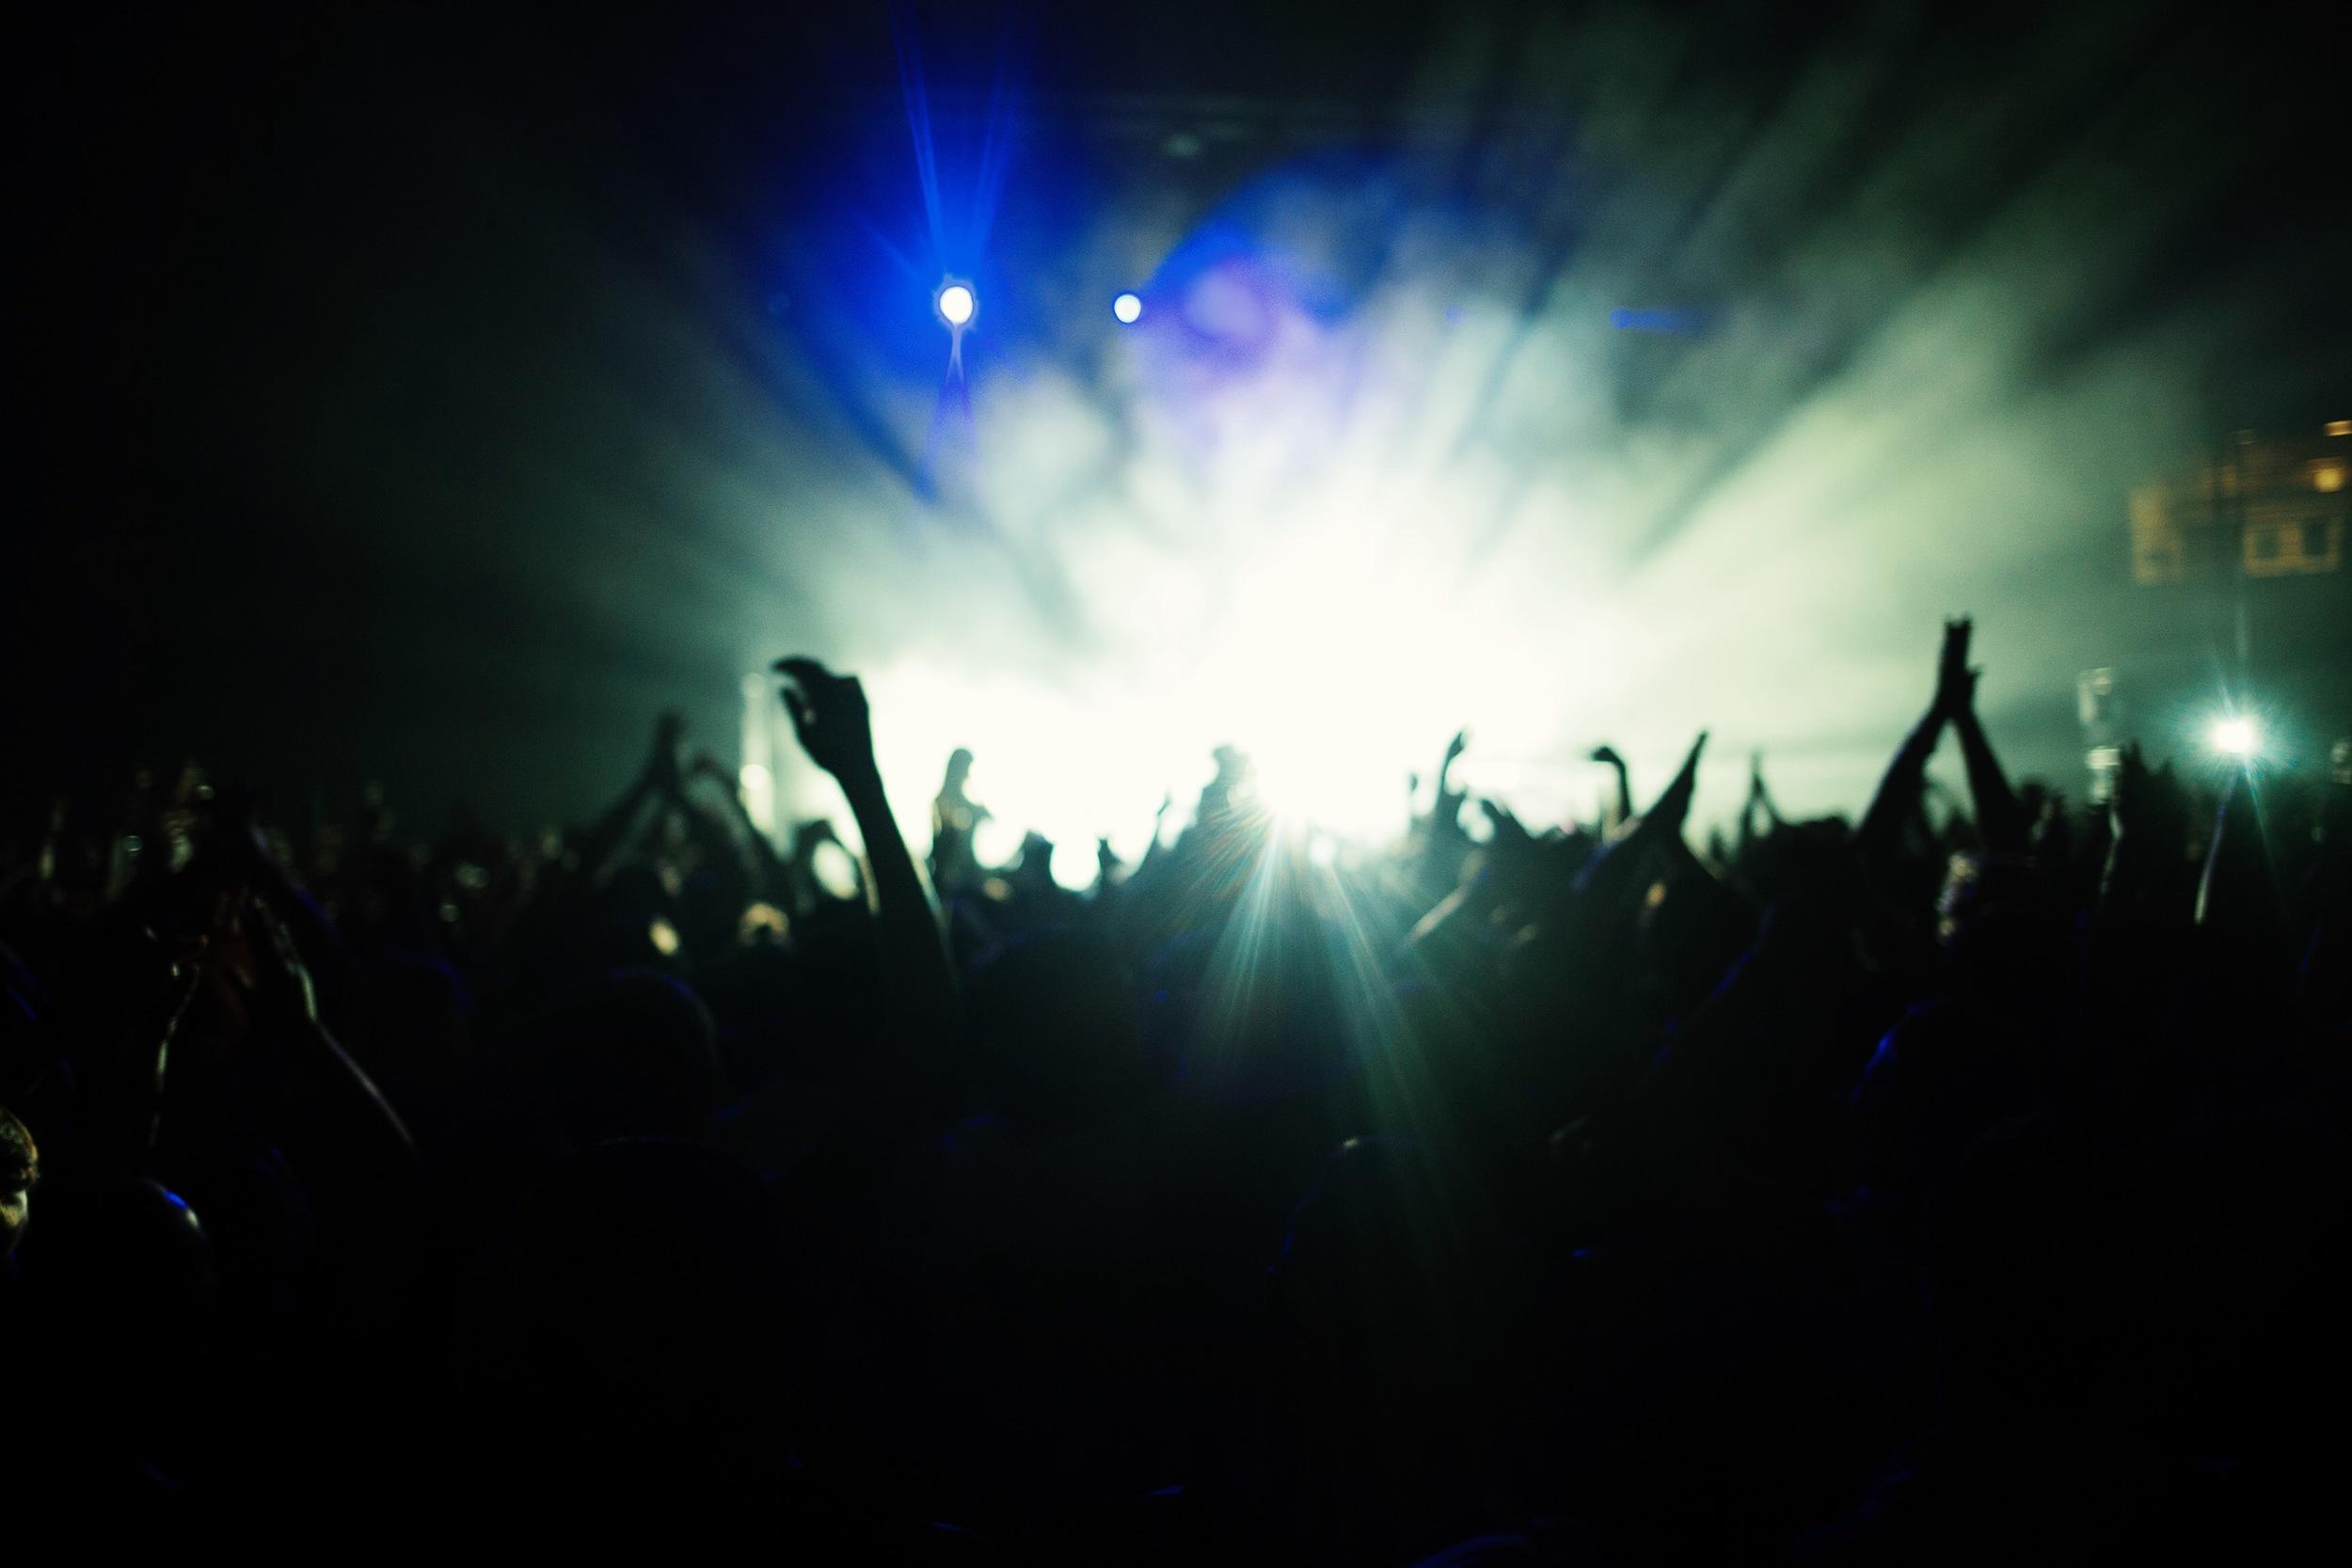 music_18667878183_o.jpg